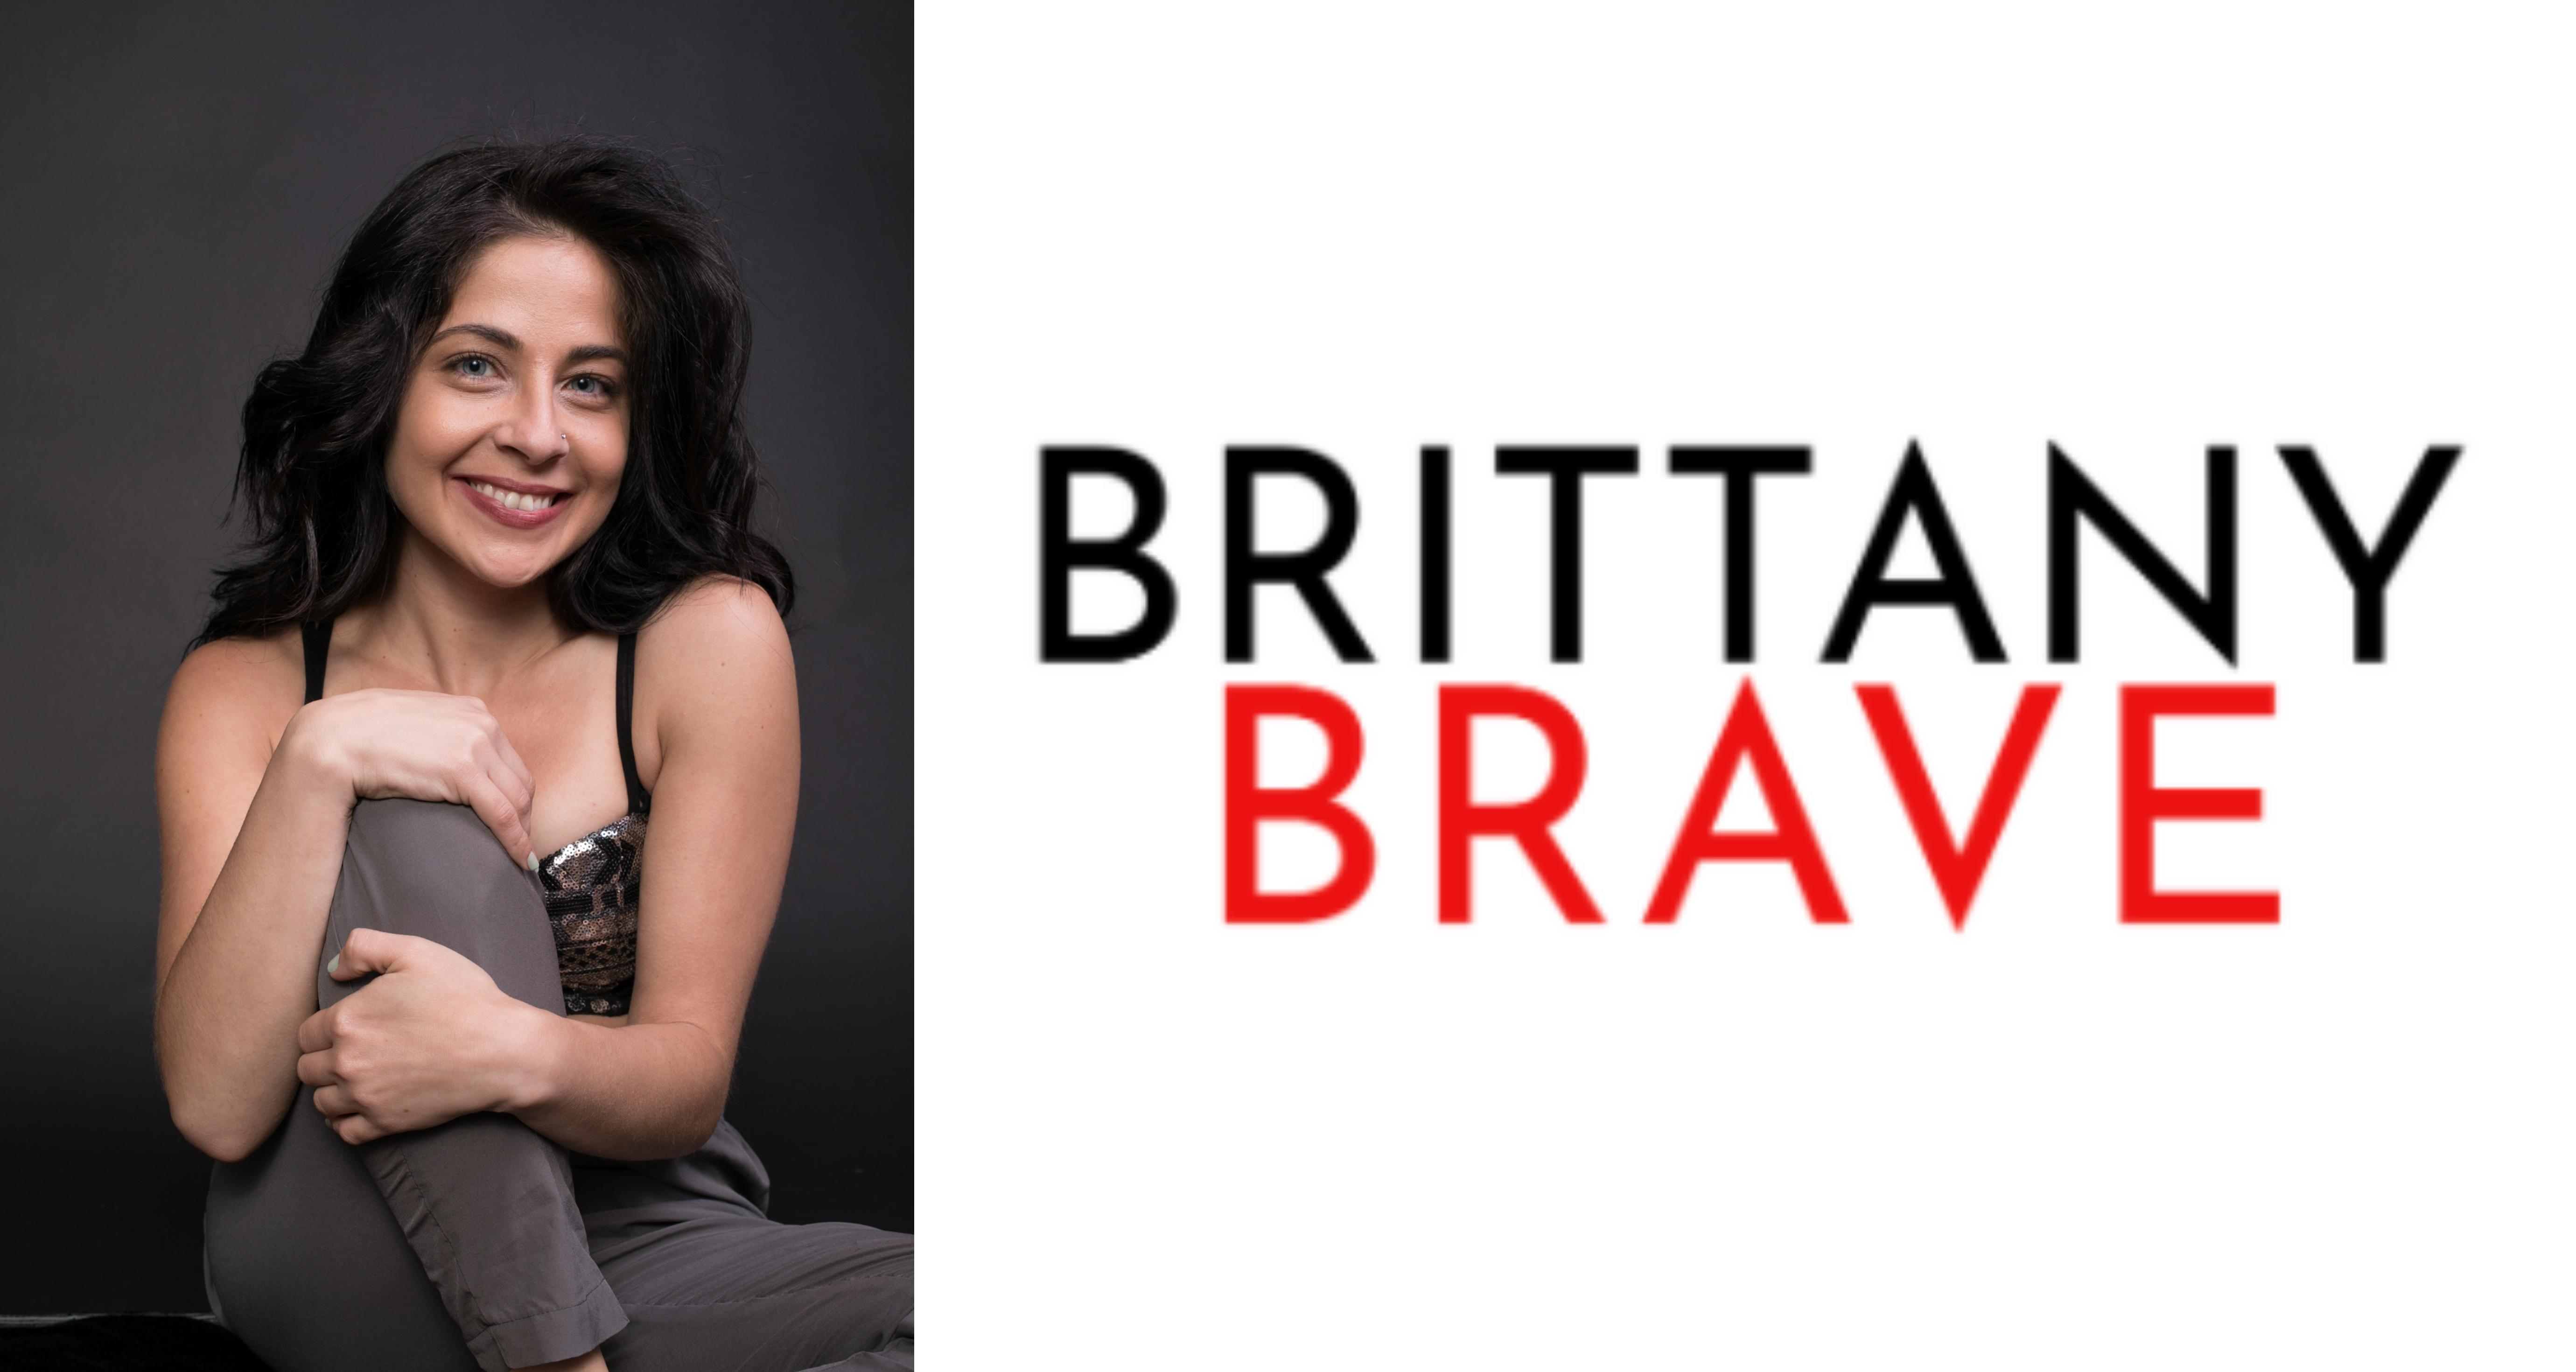 Brittany Brave